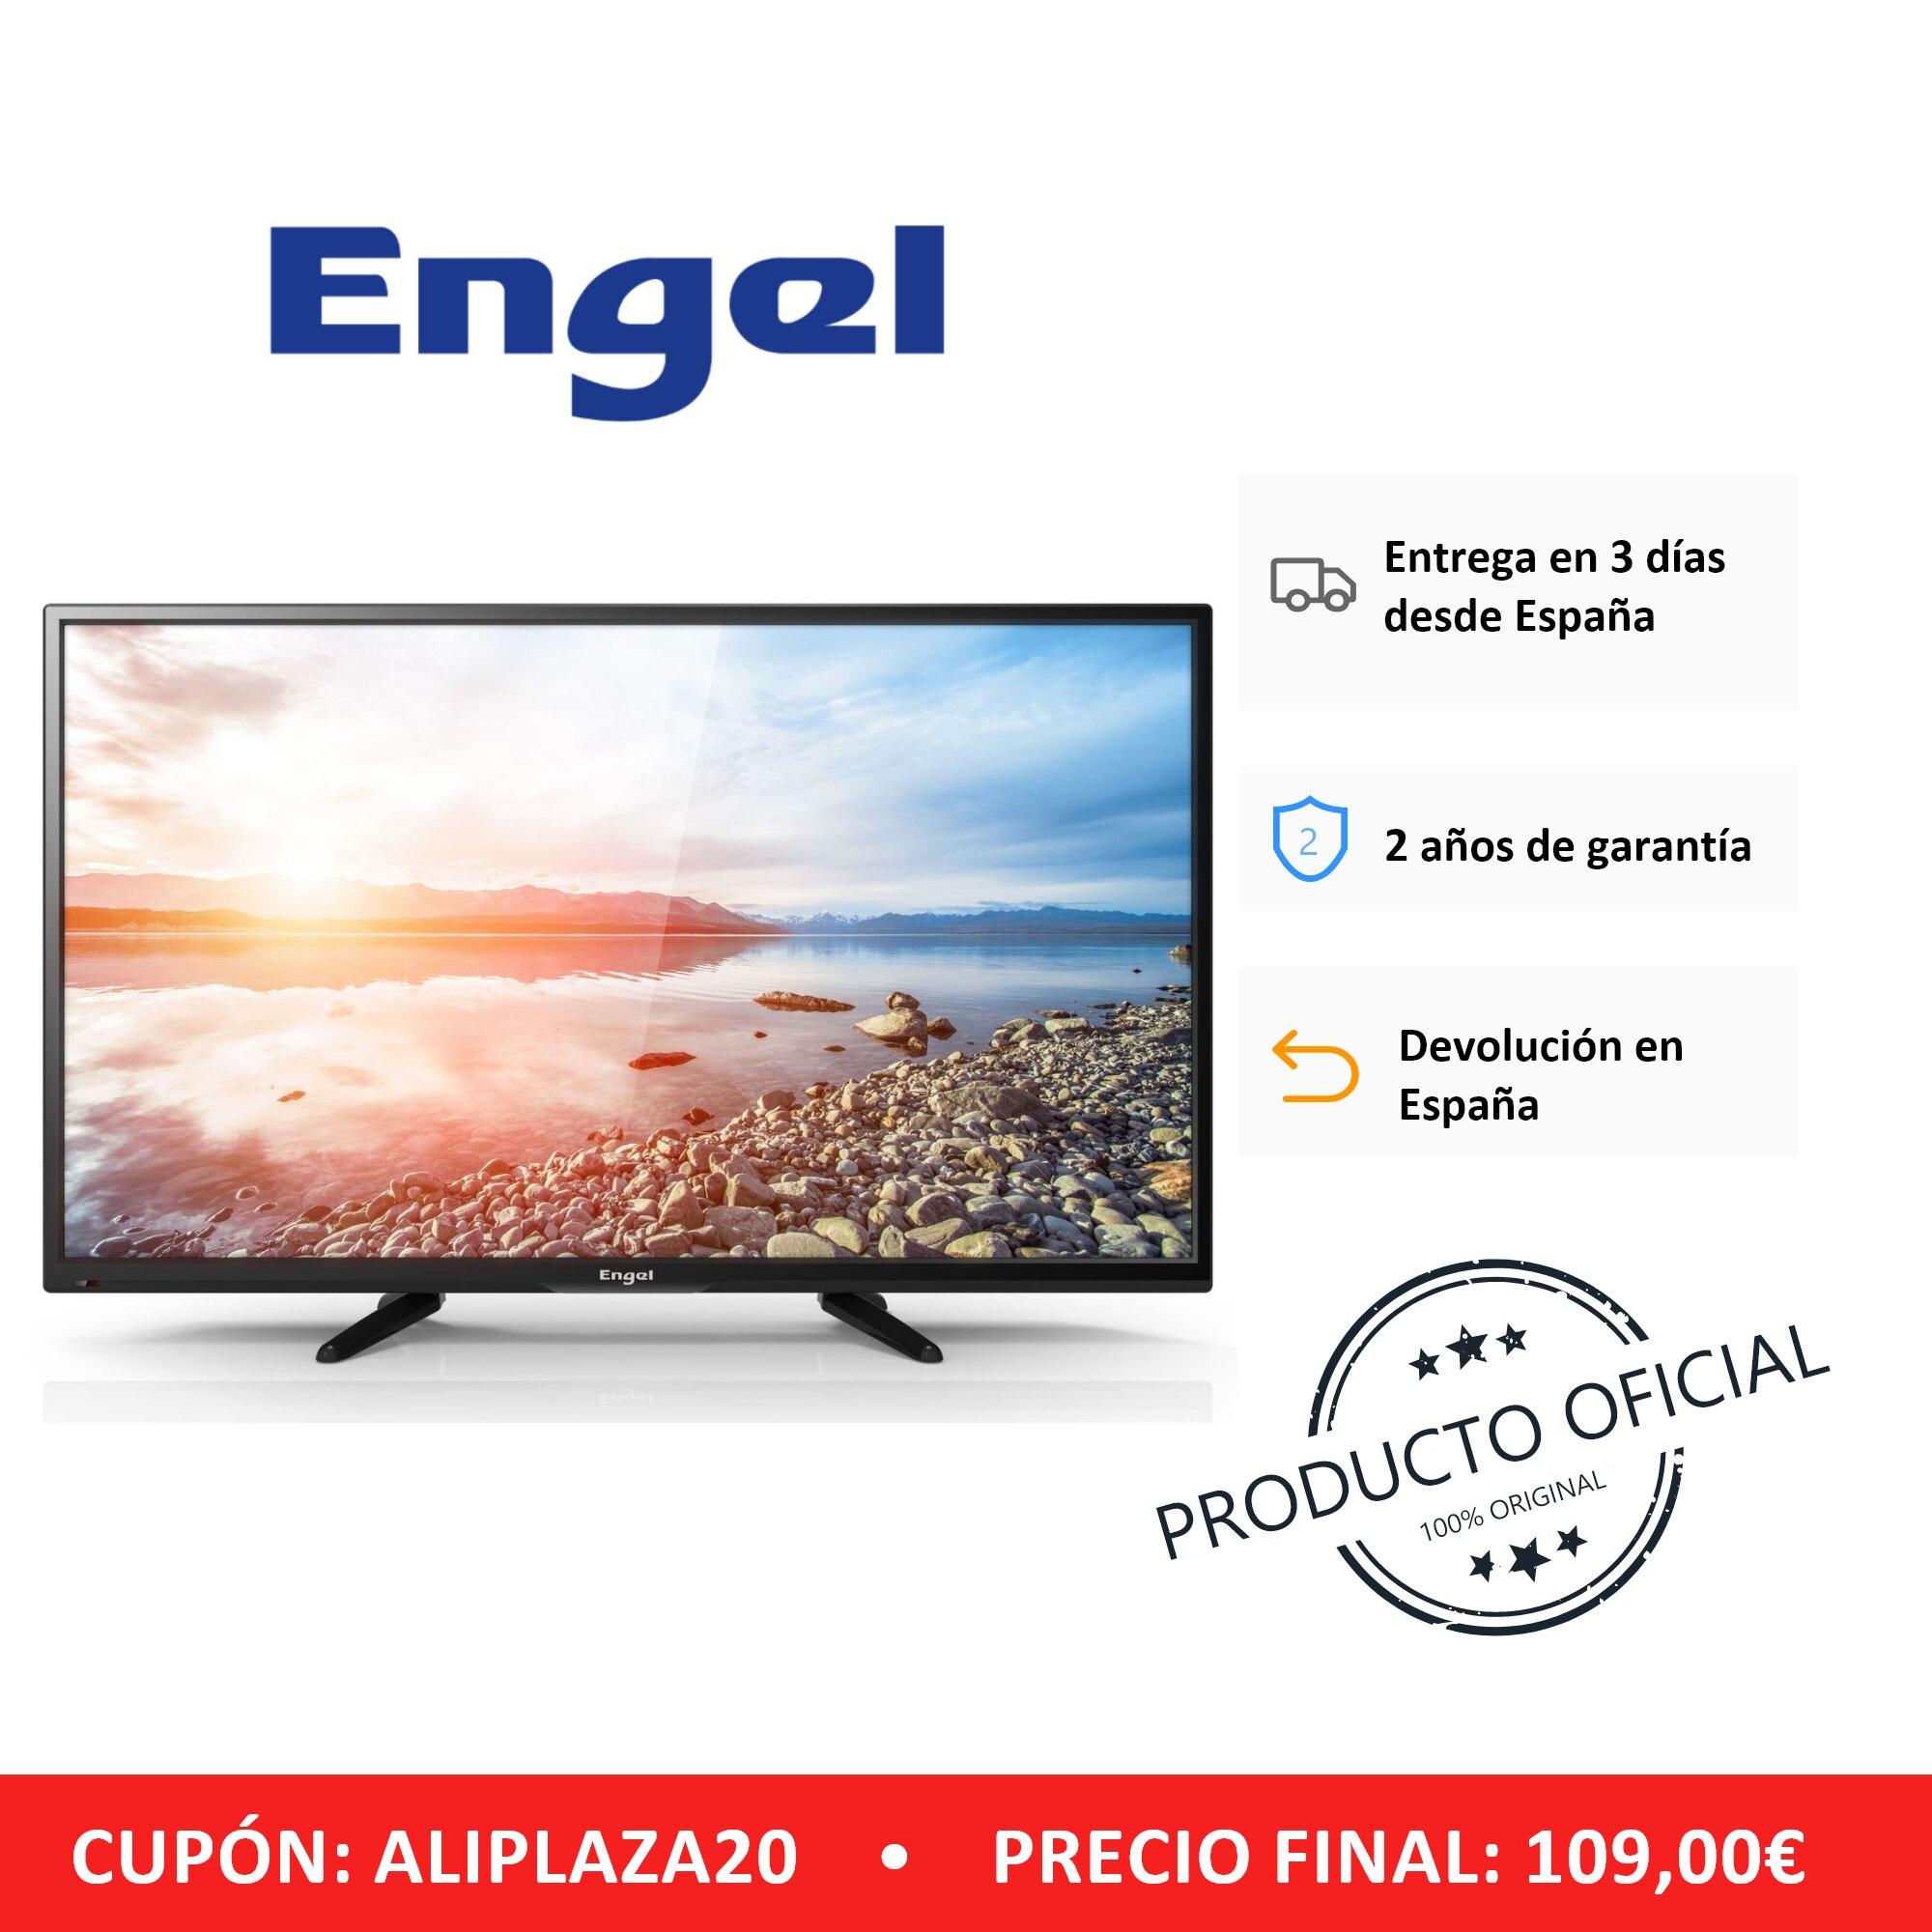 Телевизор ENGEL LE3250-светодиодный 32